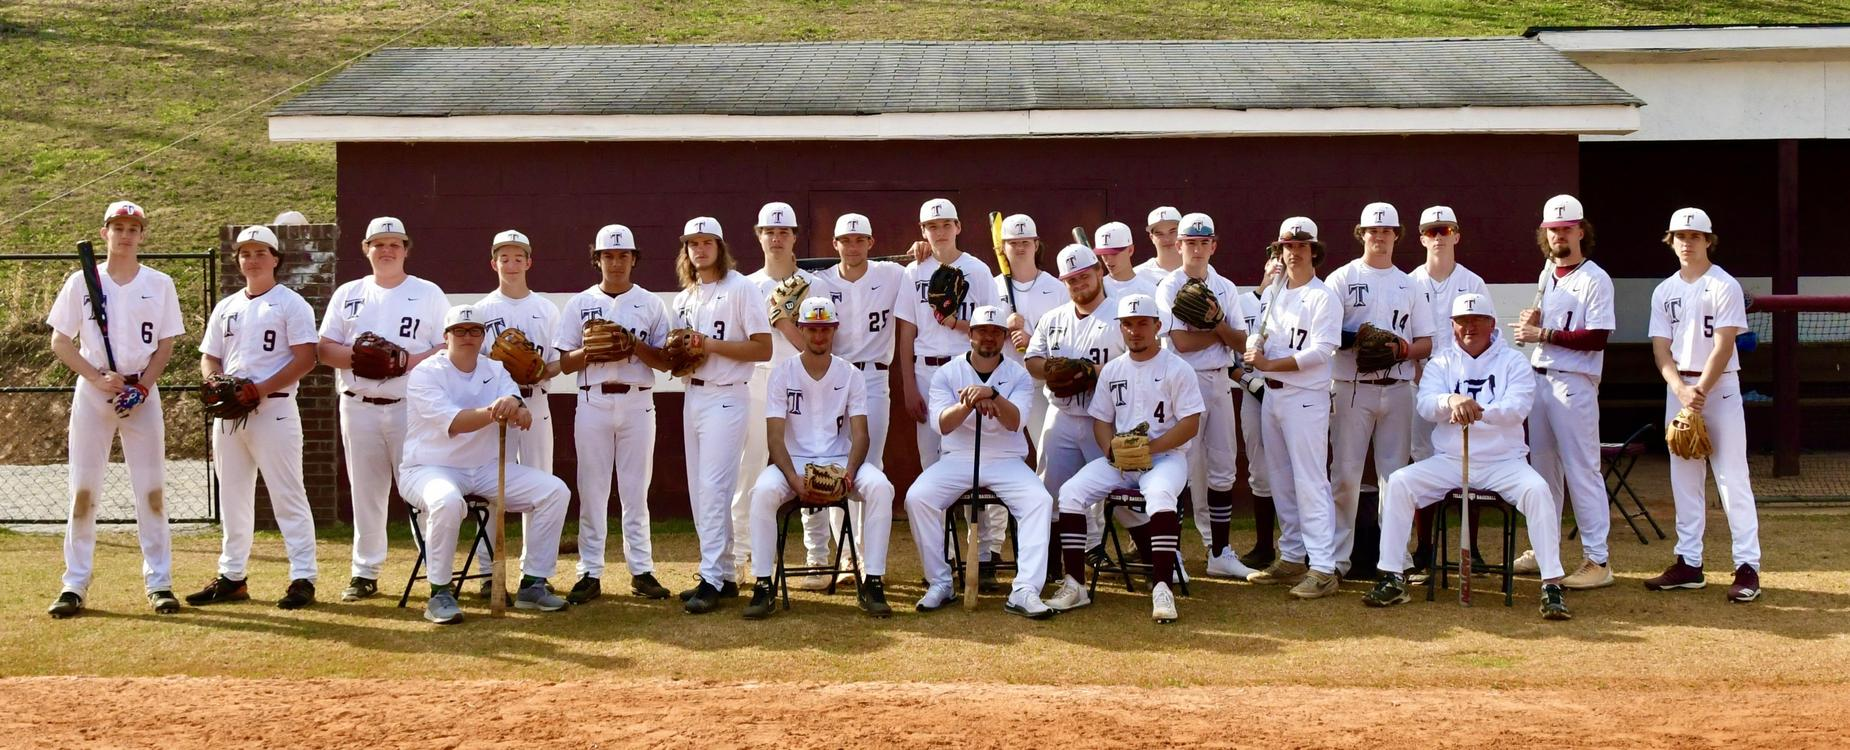 2021 Baseball Team